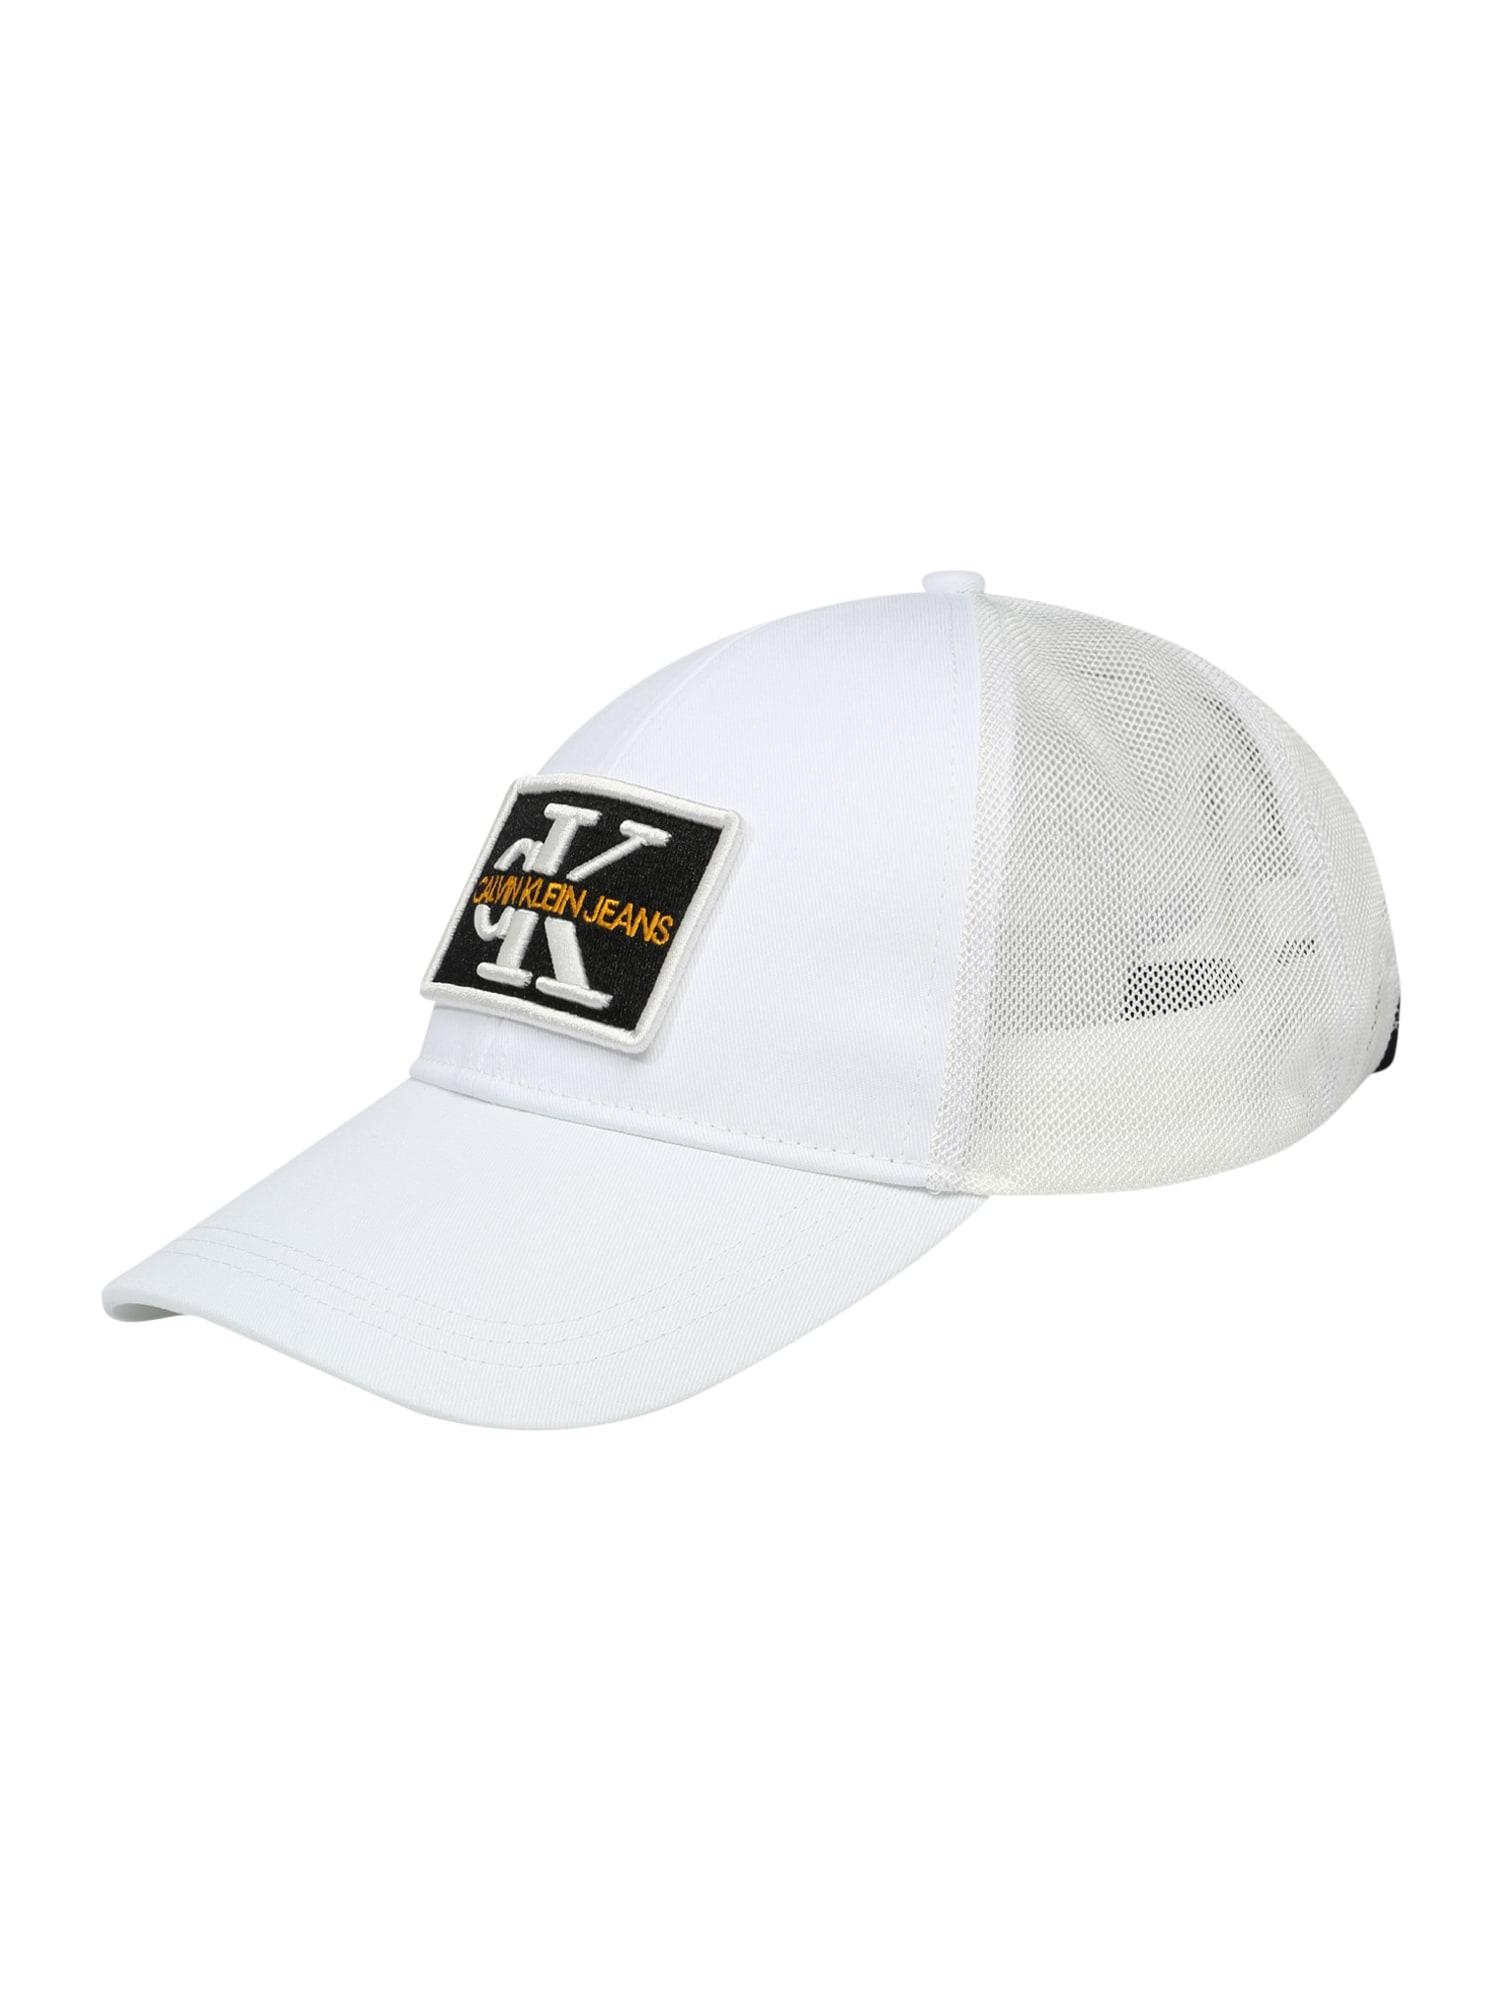 Calvin Klein Jeans Kepurė balta / juoda / tamsiai geltona